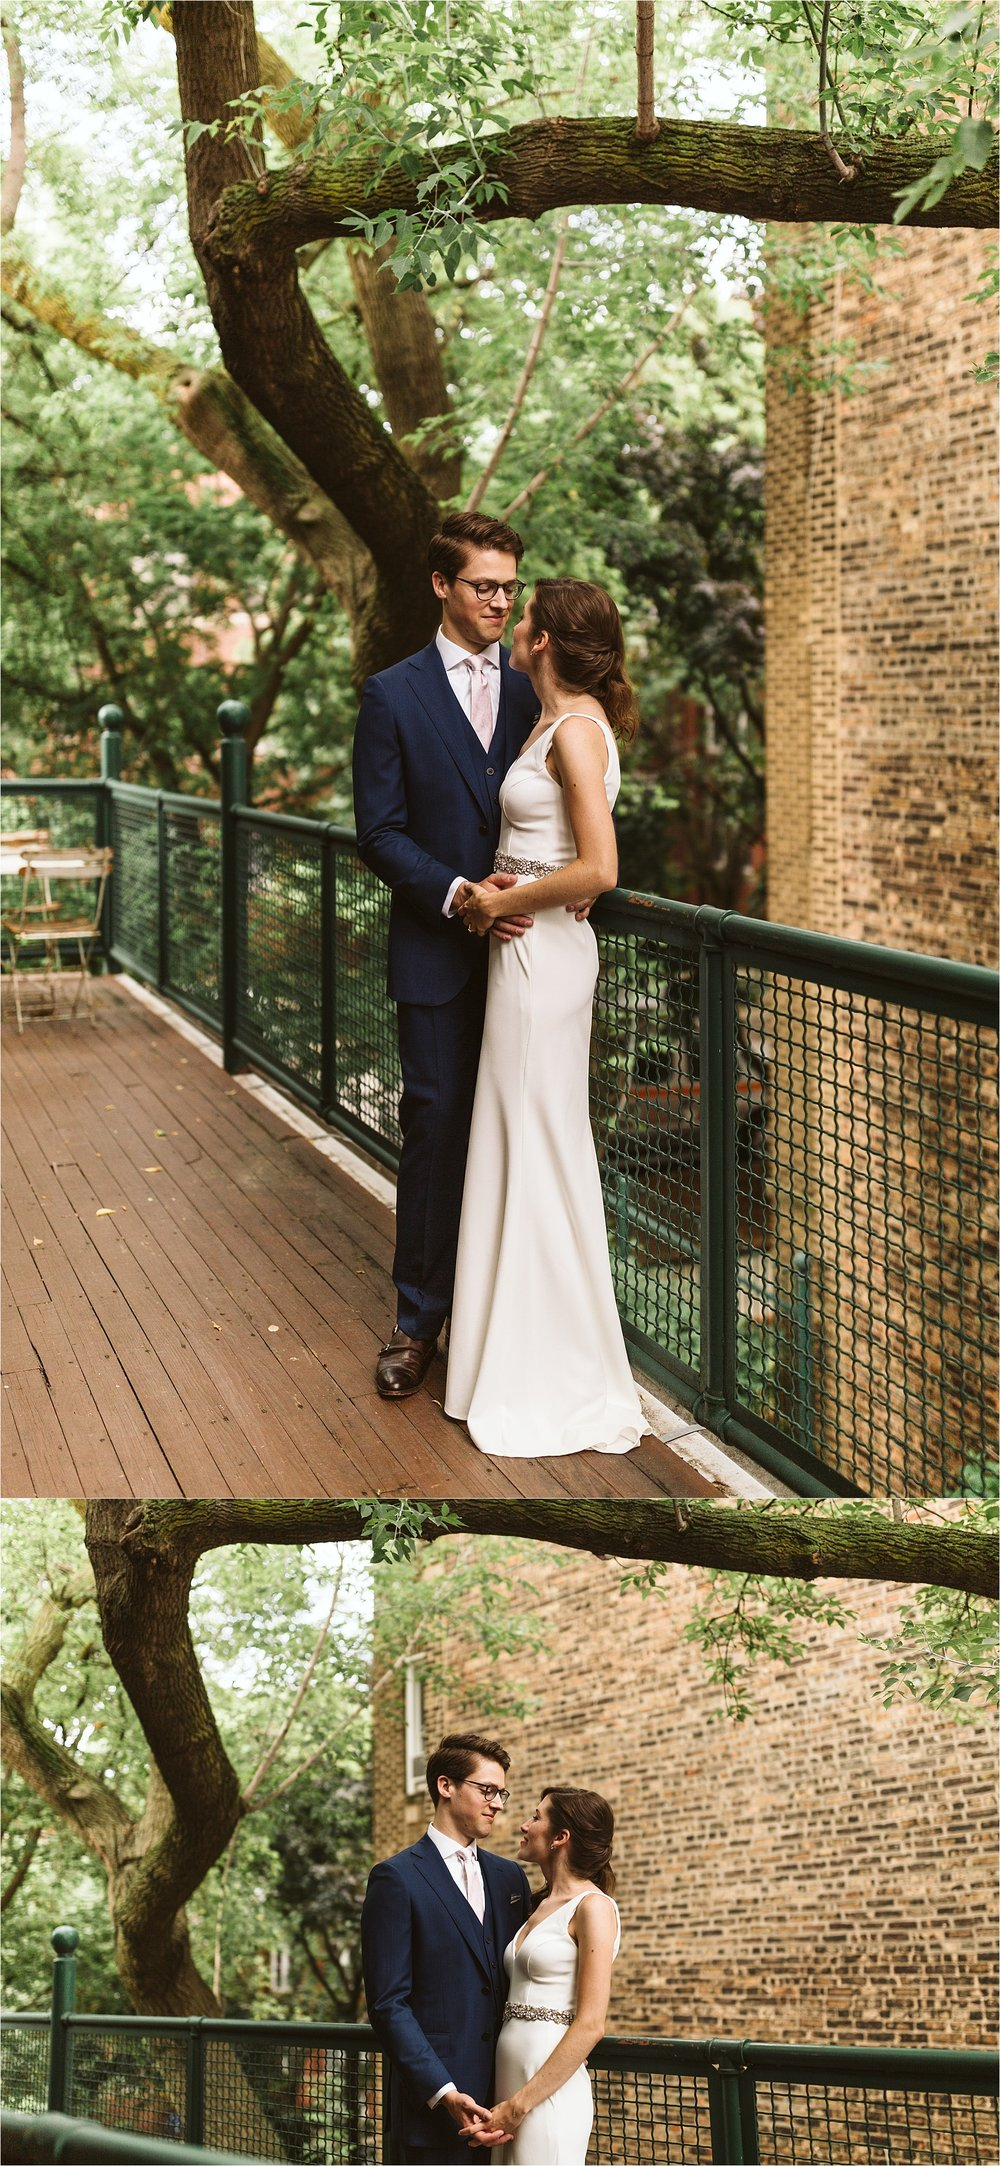 Intimate Firehouse Chicago Wedding_0021.jpg